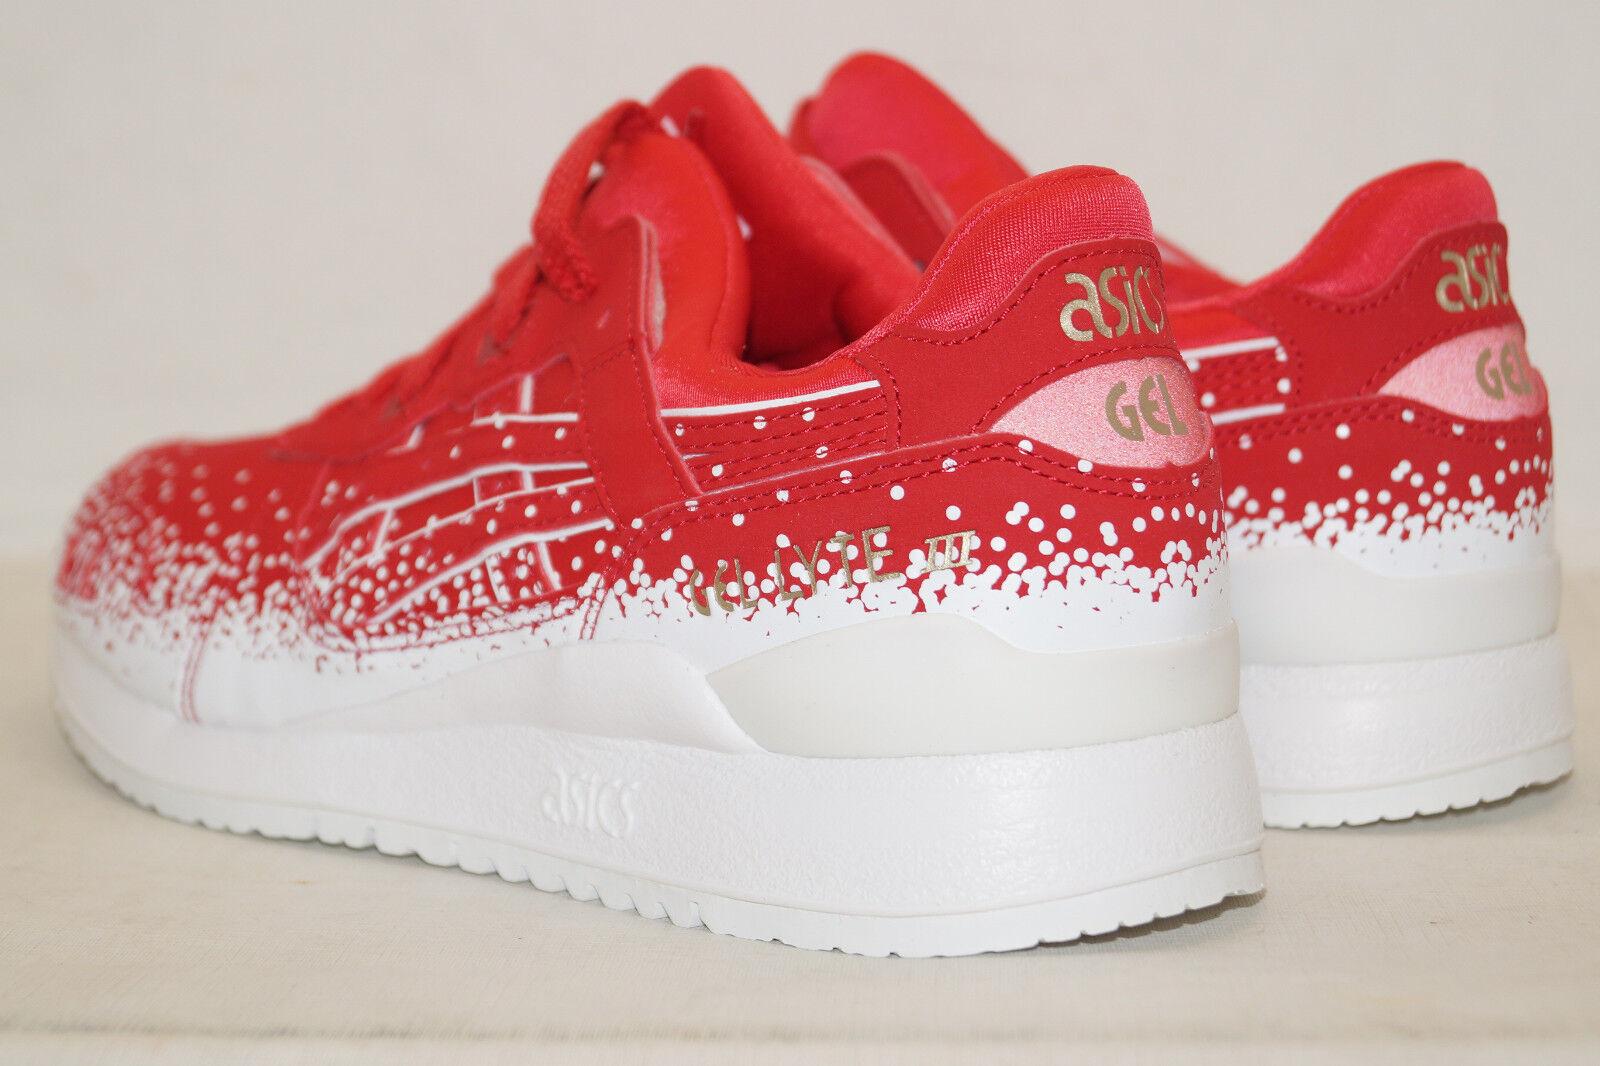 Asics Asics Asics Gel-Lyte III UE 37 UK 4 Femmes Wmns hy6b9 Rouge Blanc Baskets Chaussures De Sport 5b2896